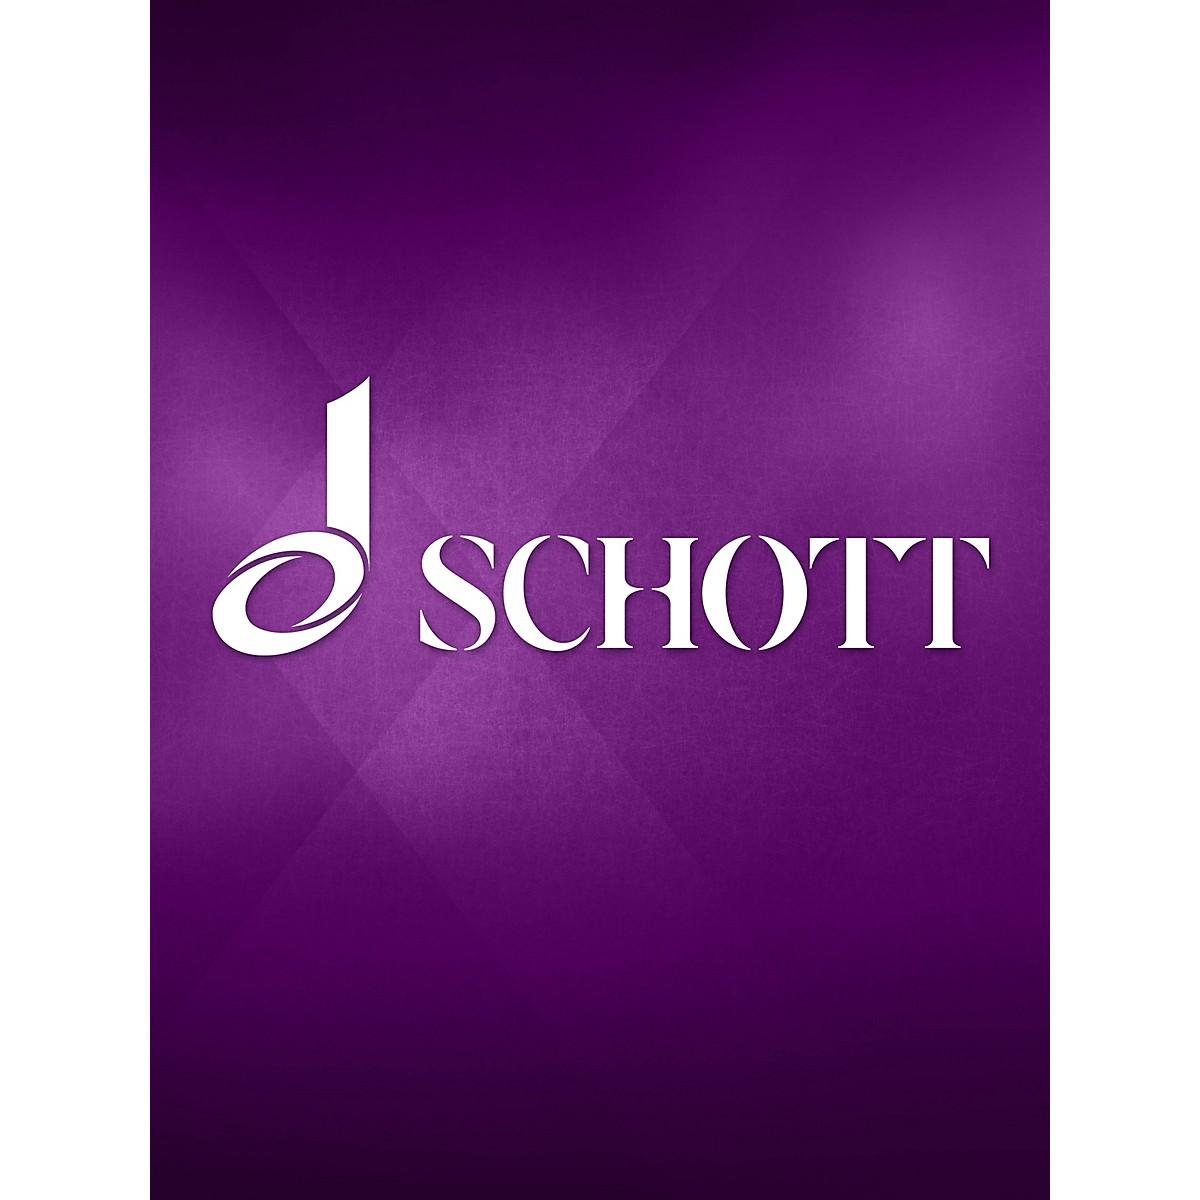 Zen-On Et Ses Melodies Oeuvres Vol. 2 Schott Series by Claude Debussy